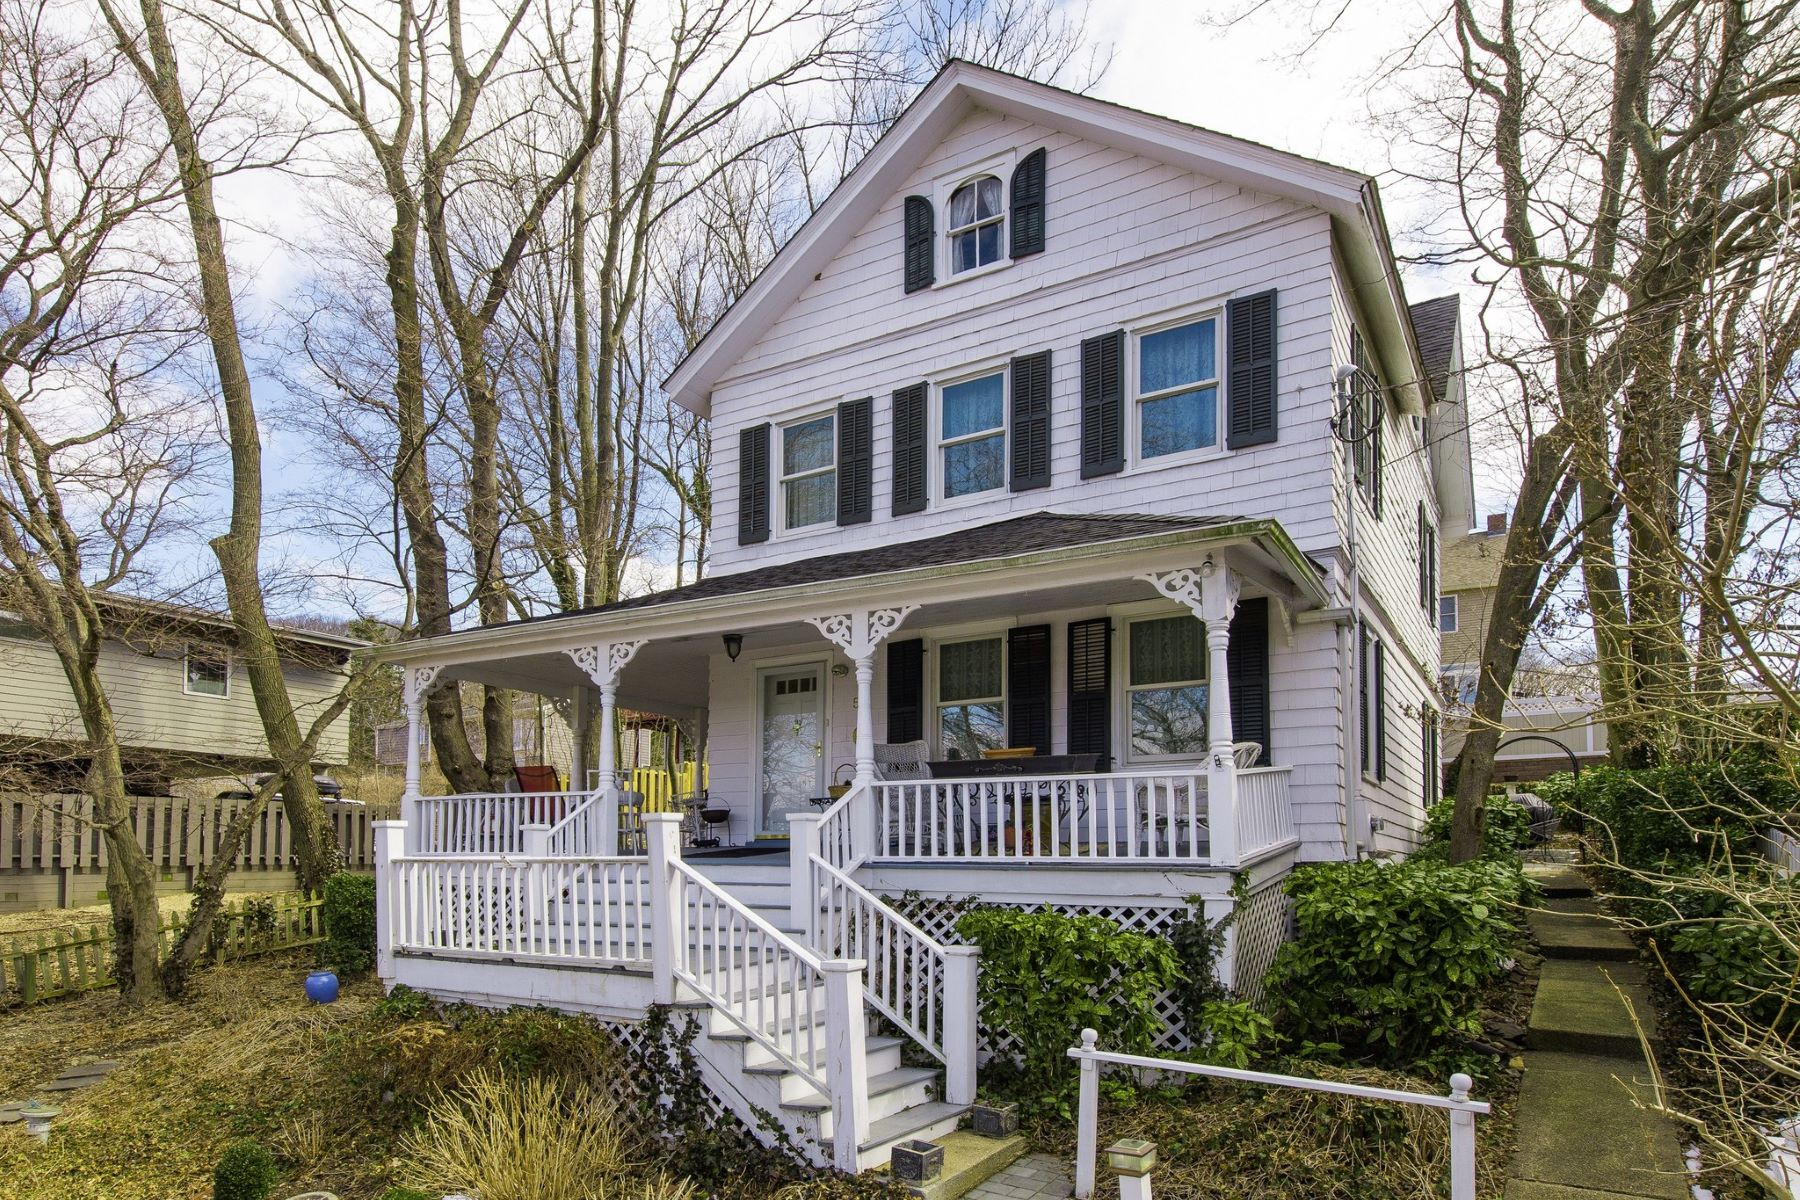 Single Family Homes for Sale at Roslyn Harbor 54 Bryant Ave Roslyn Harbor, New York 11576 United States